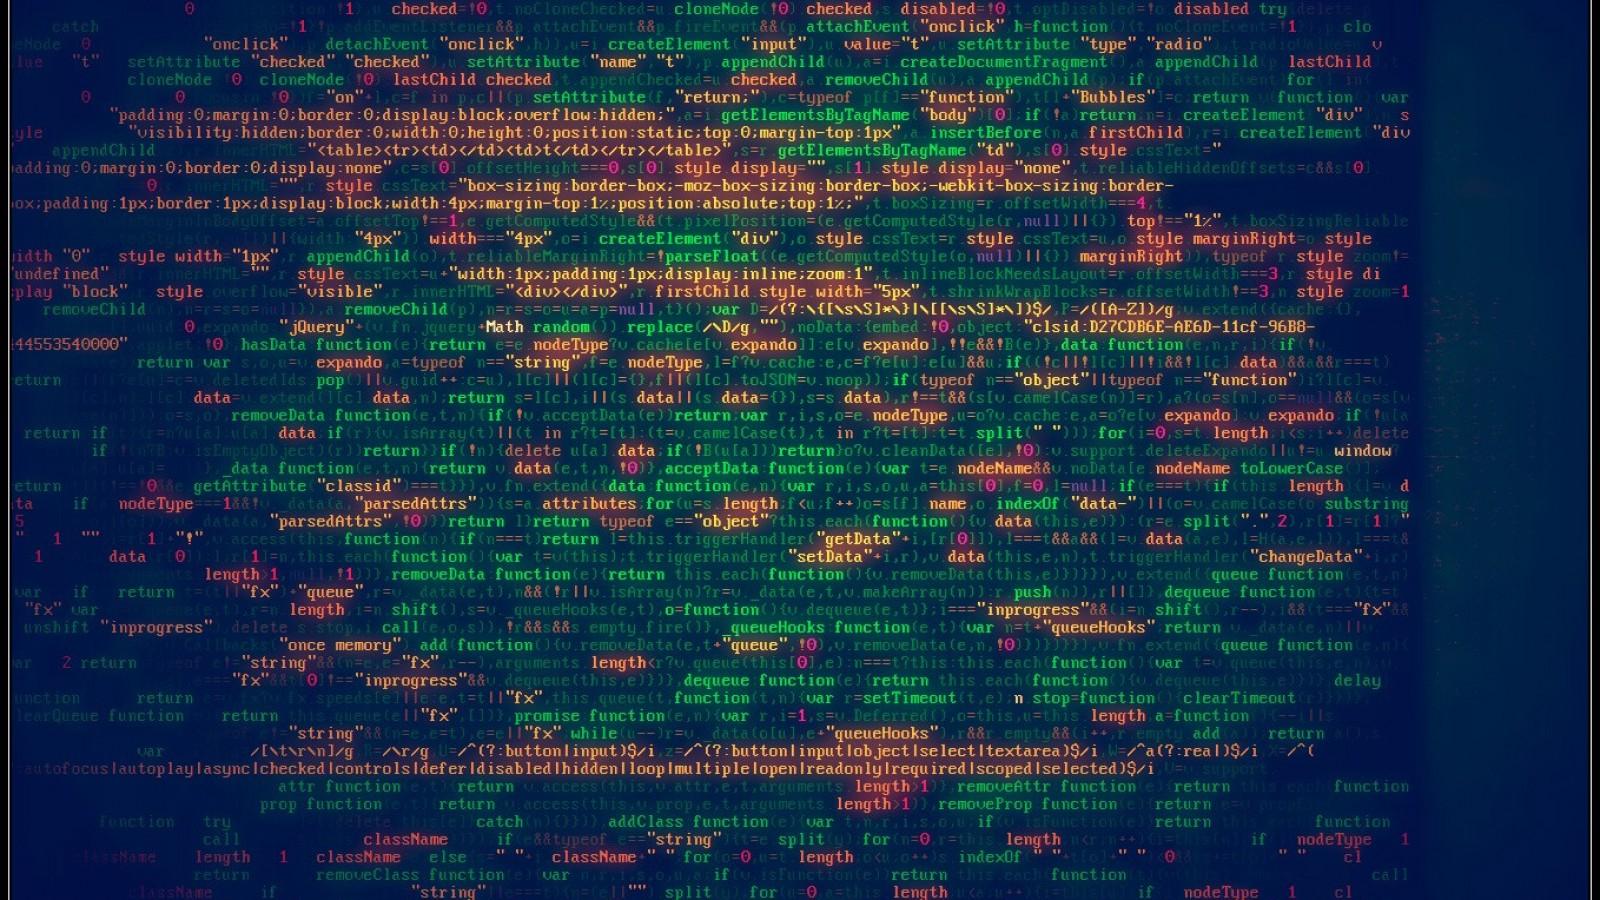 37 Programmer Code Wallpaper Backgrounds Download 1600x900